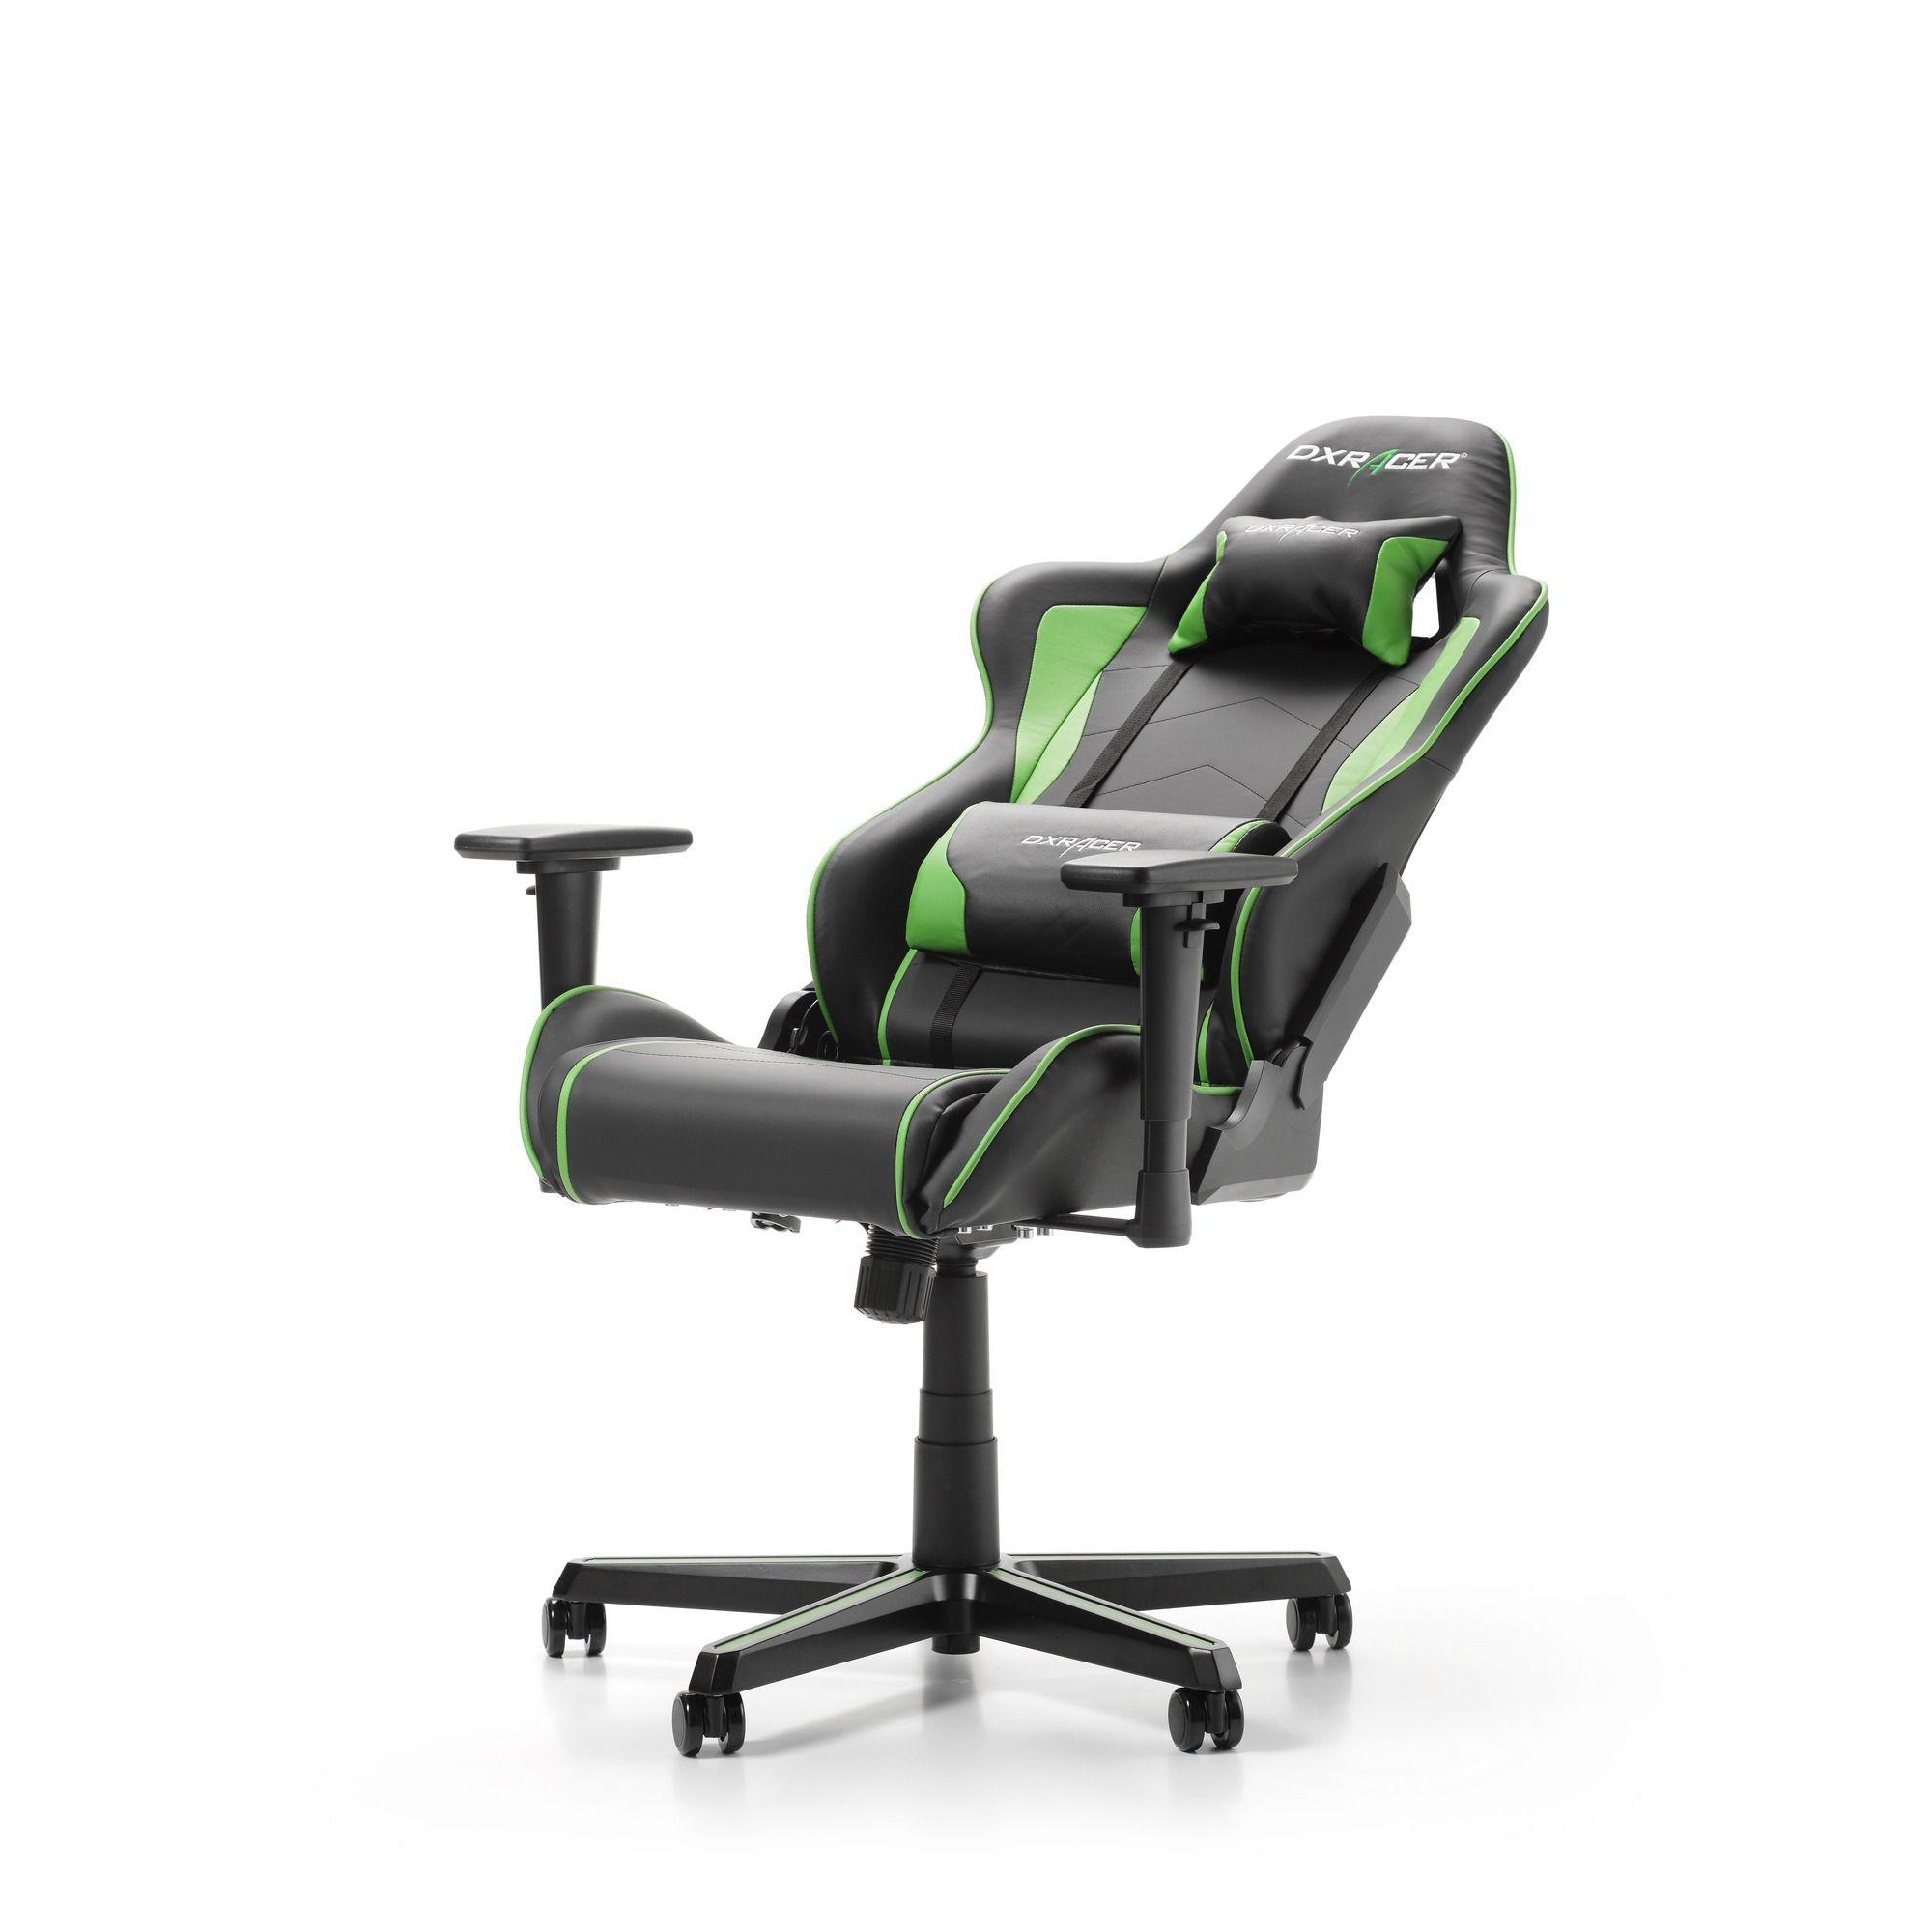 Геймърски стол DXRacer - серия FORMULA, черен/зелен - OH/FH08/NE - 4